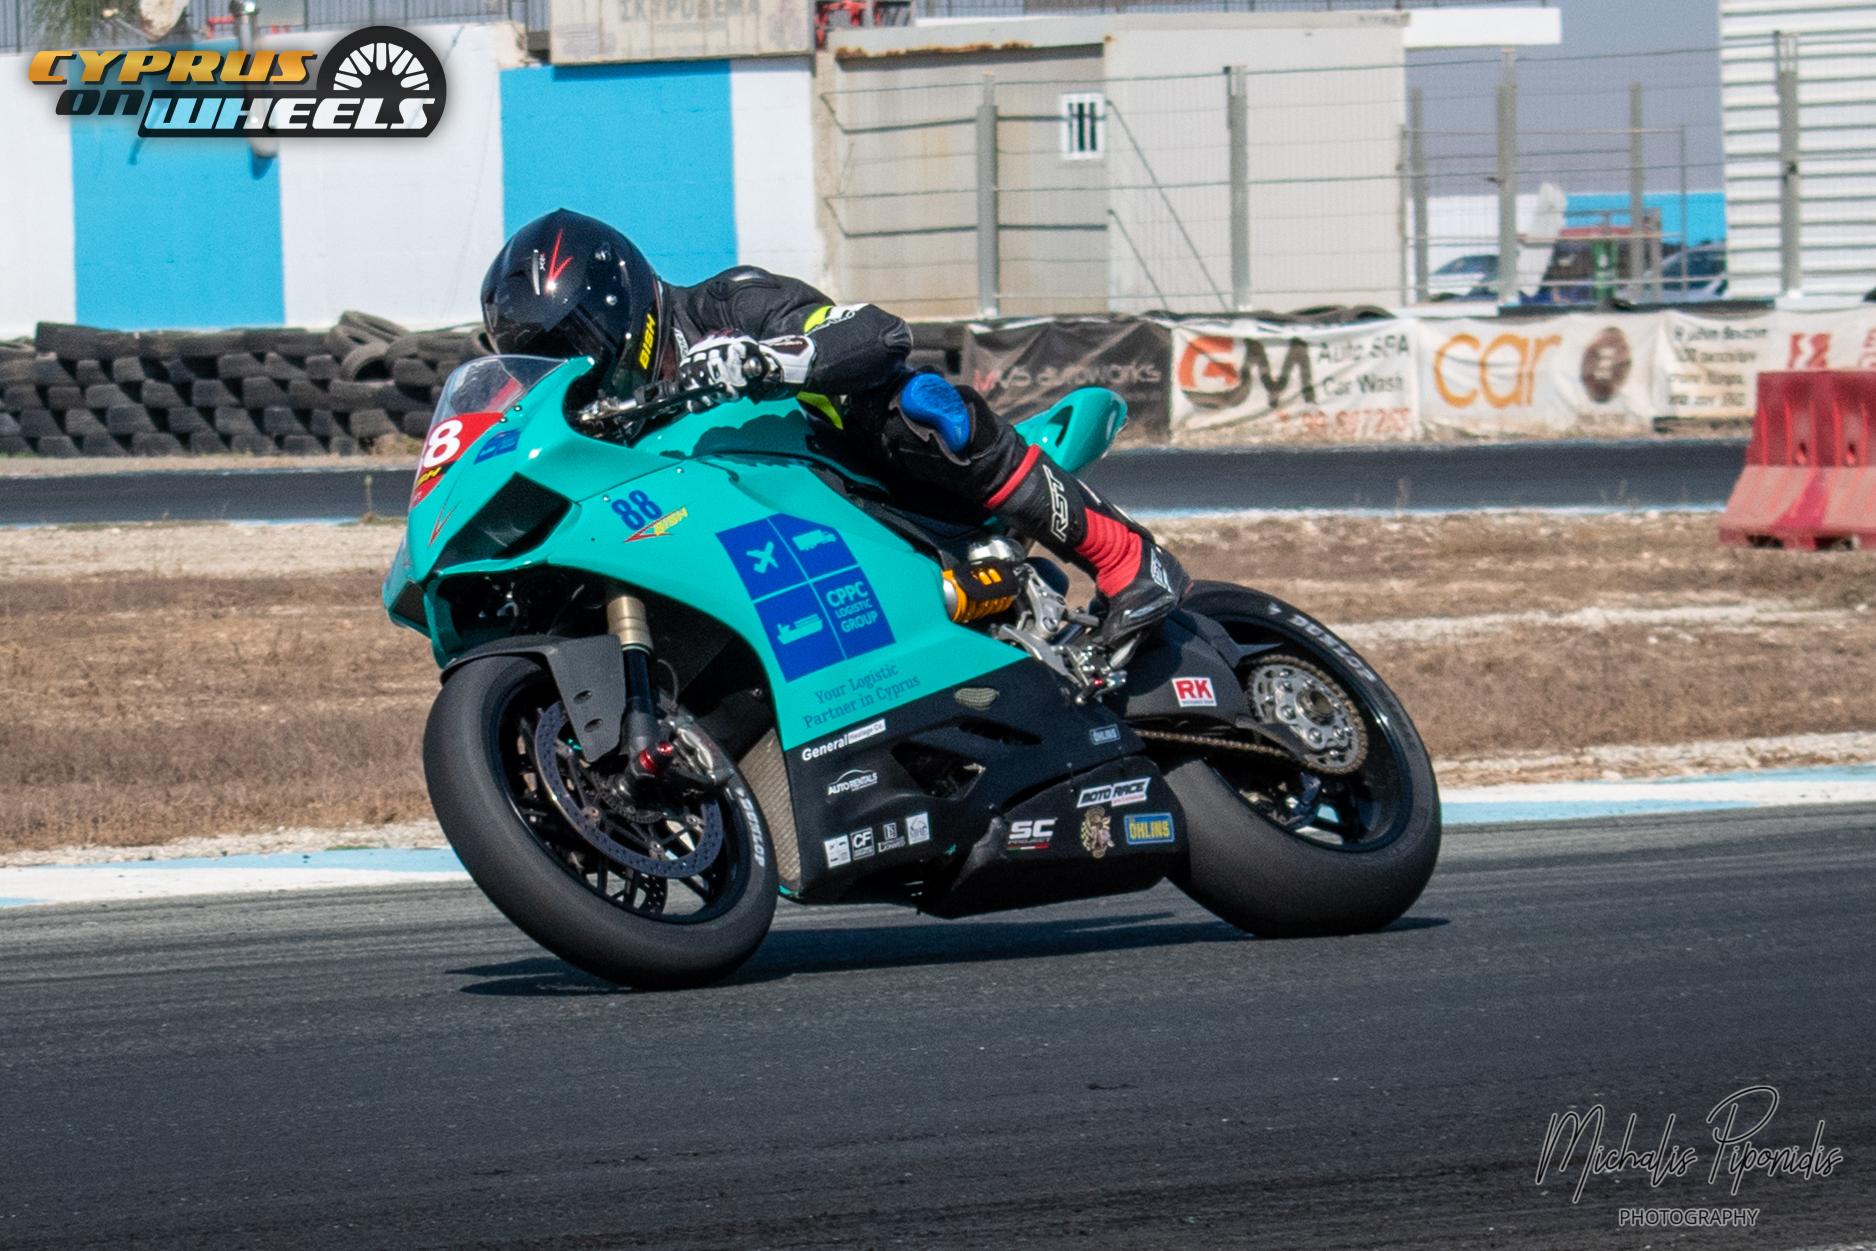 Ducati panigale racing